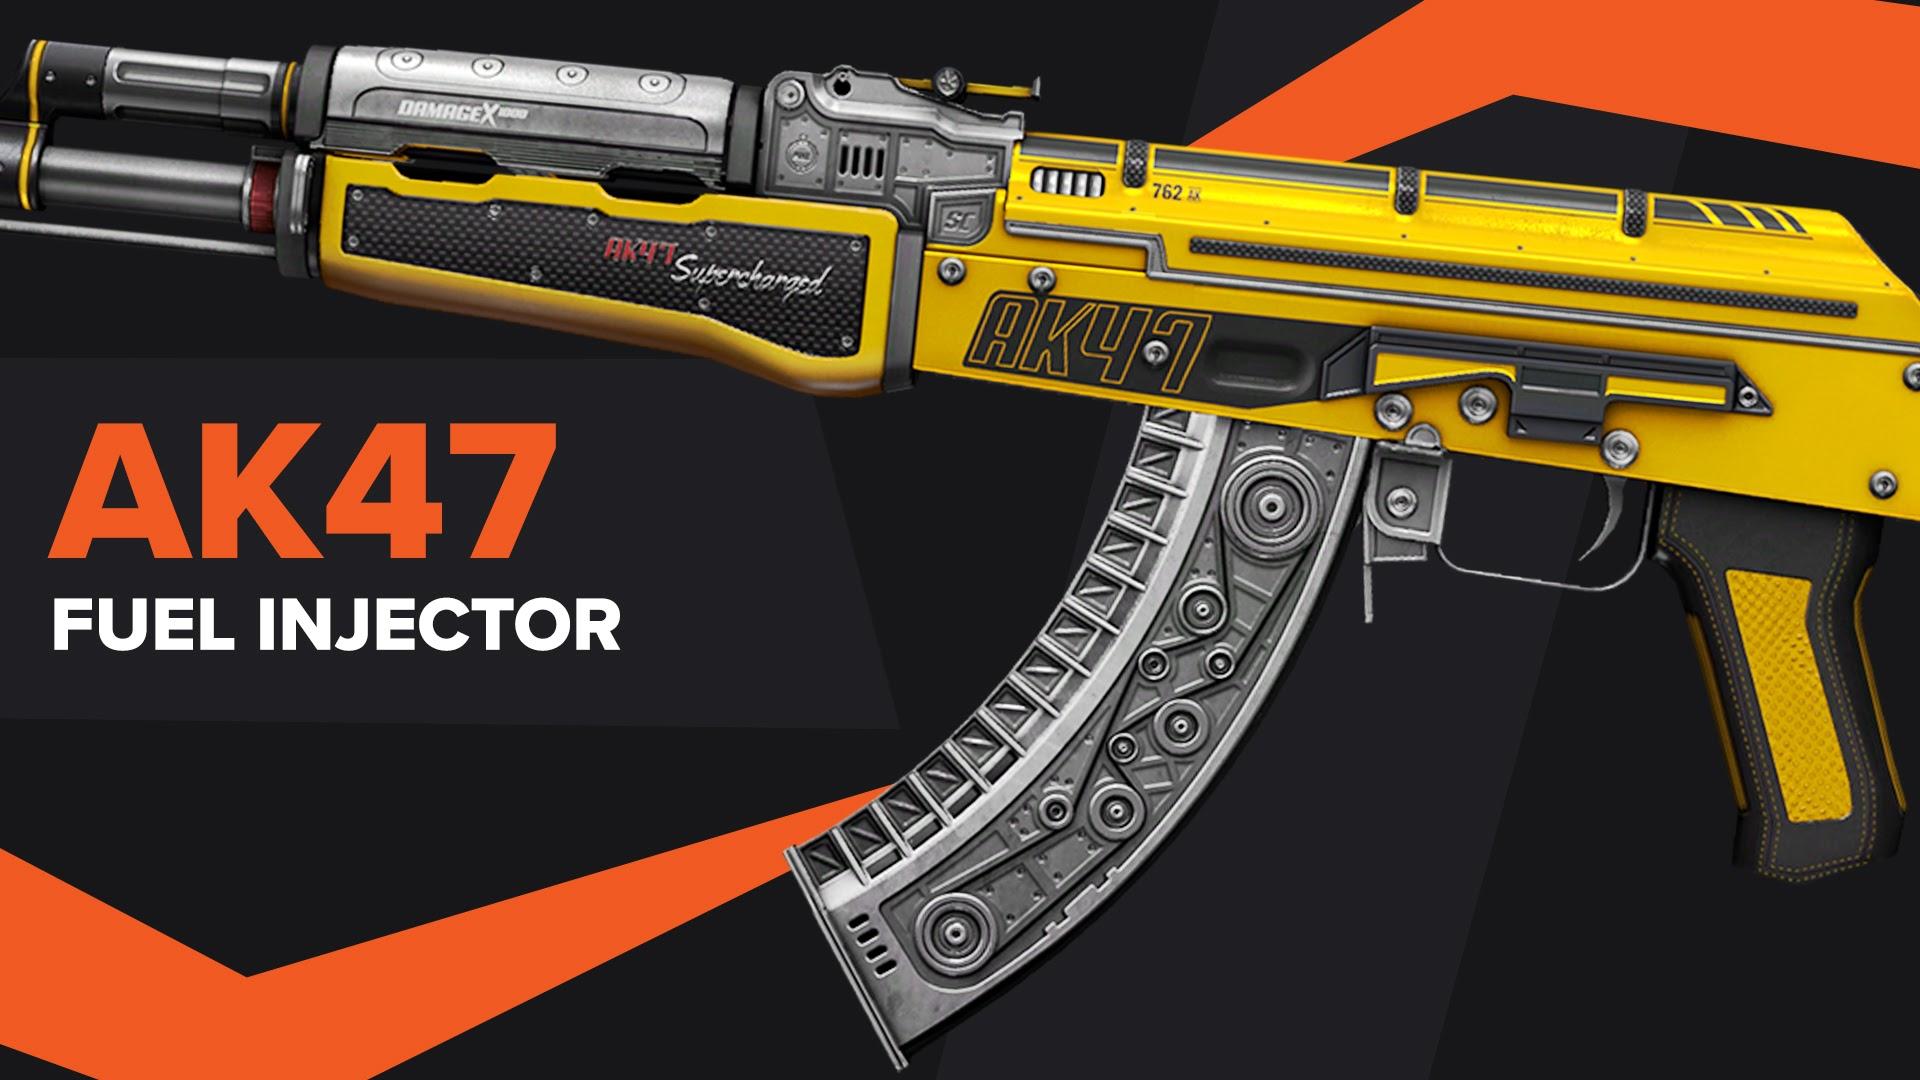 AK47 Fuel Injector CSGO Skin